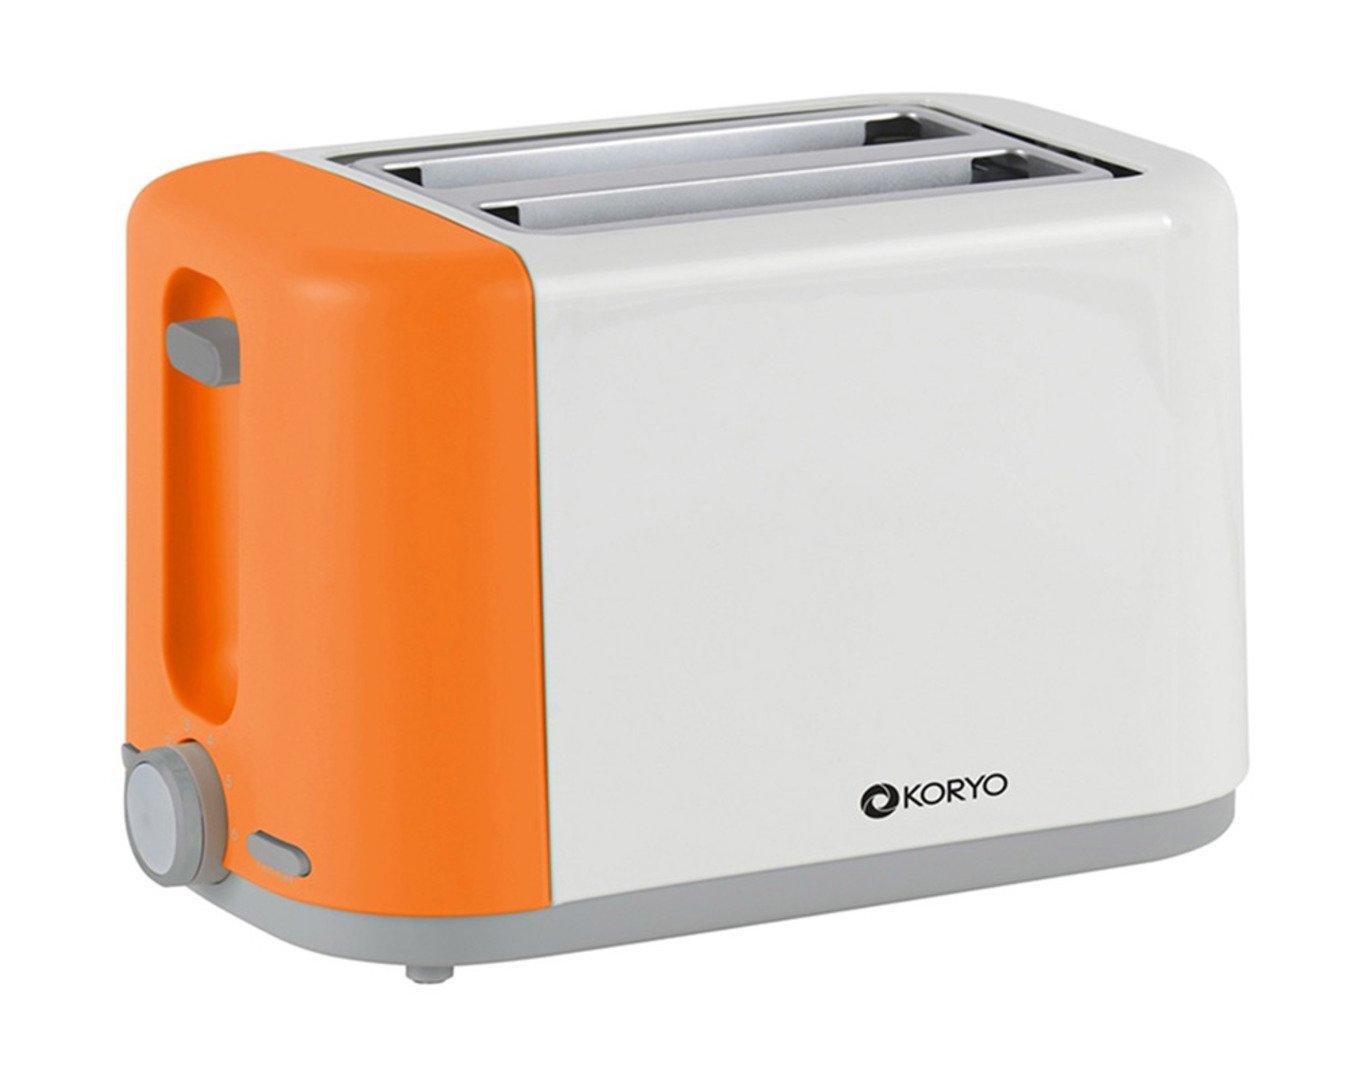 Koryo KPT1270BCO 2 Slice Pop up Toaster